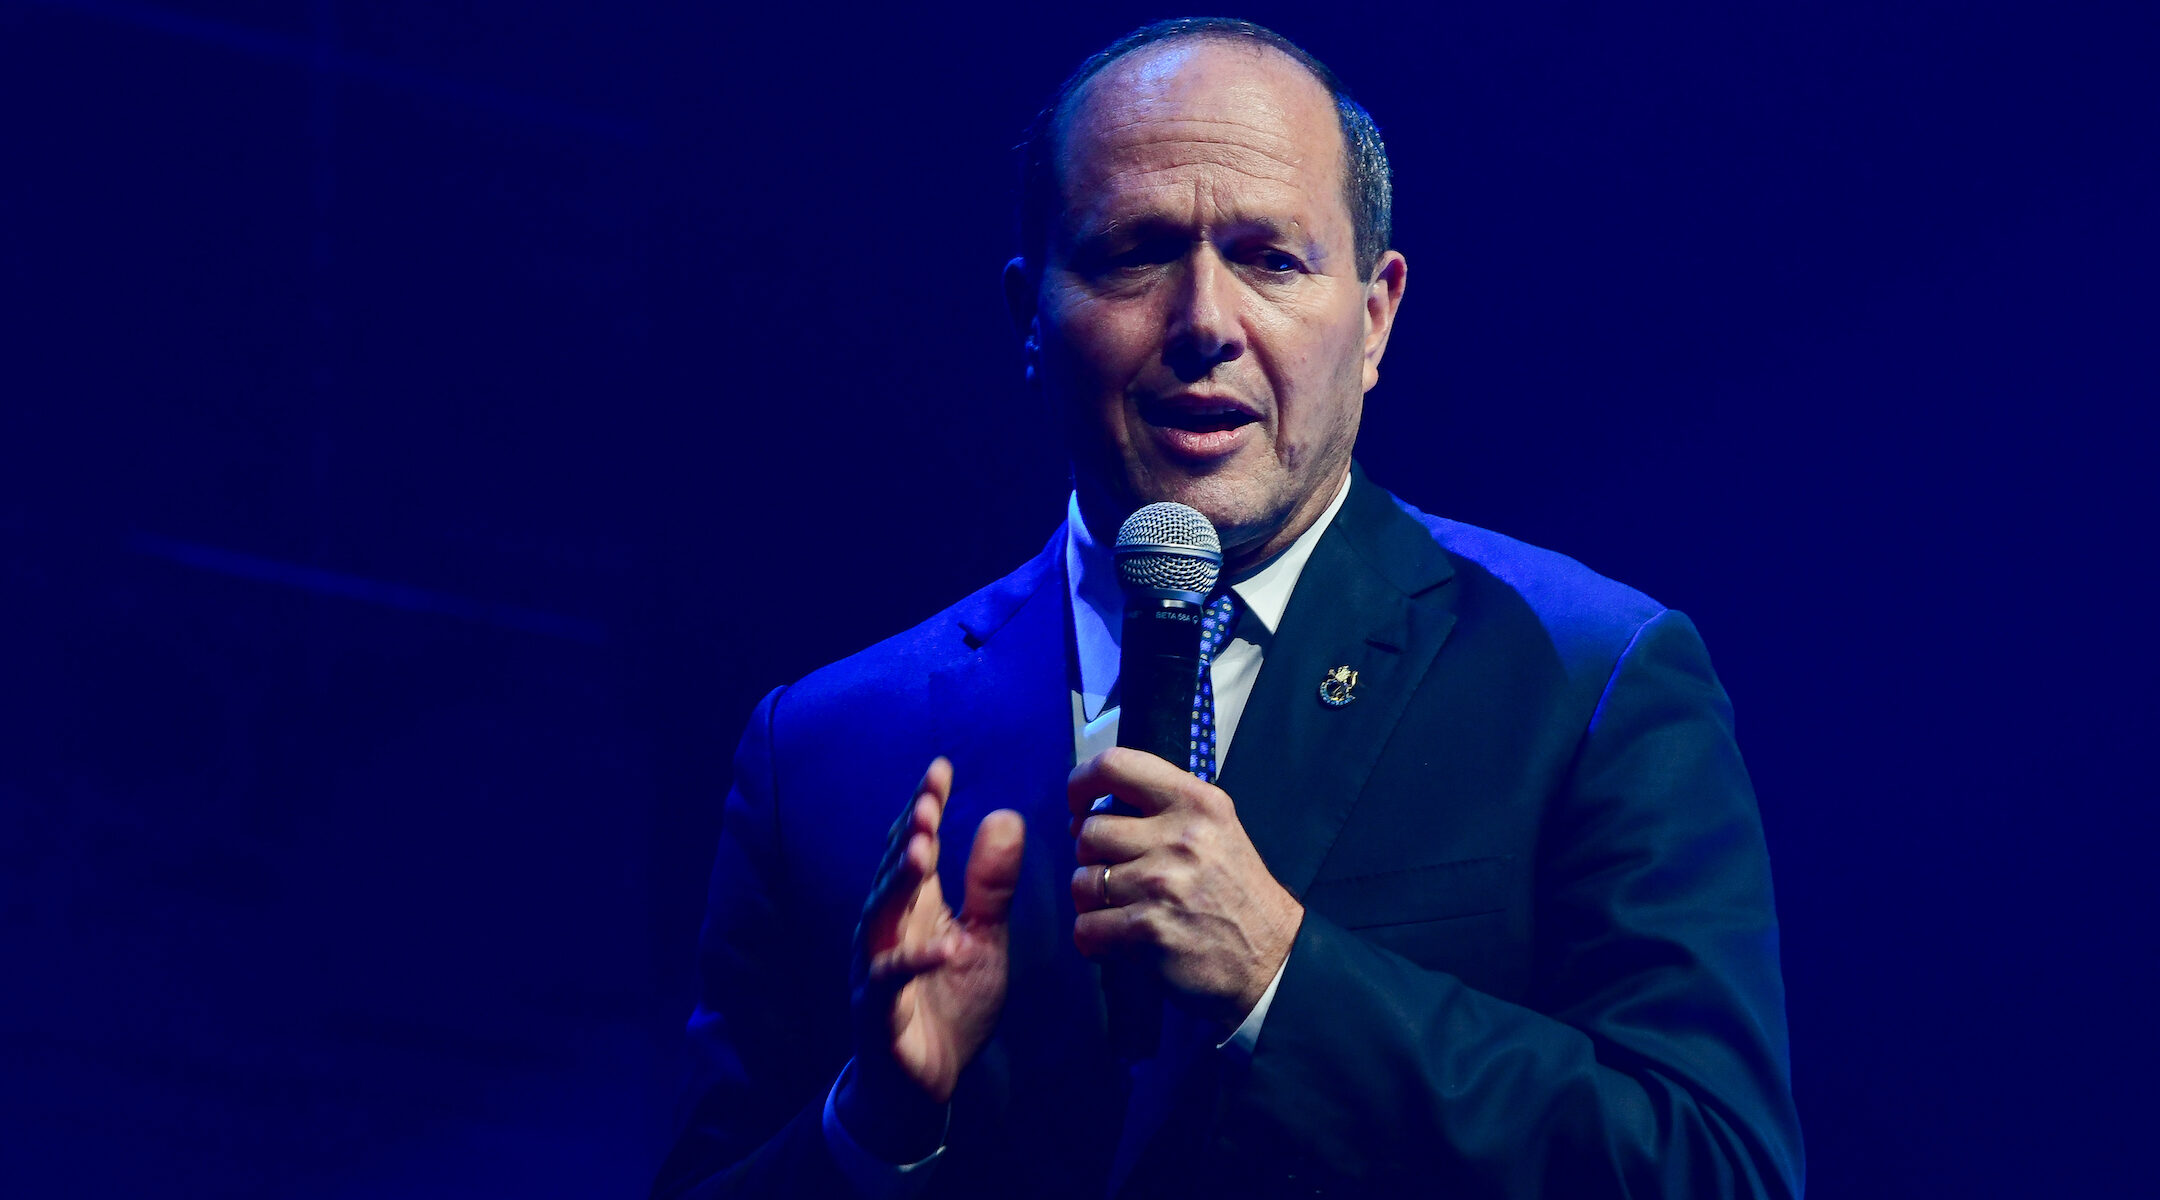 Nir Barkat, Likud lawmaker